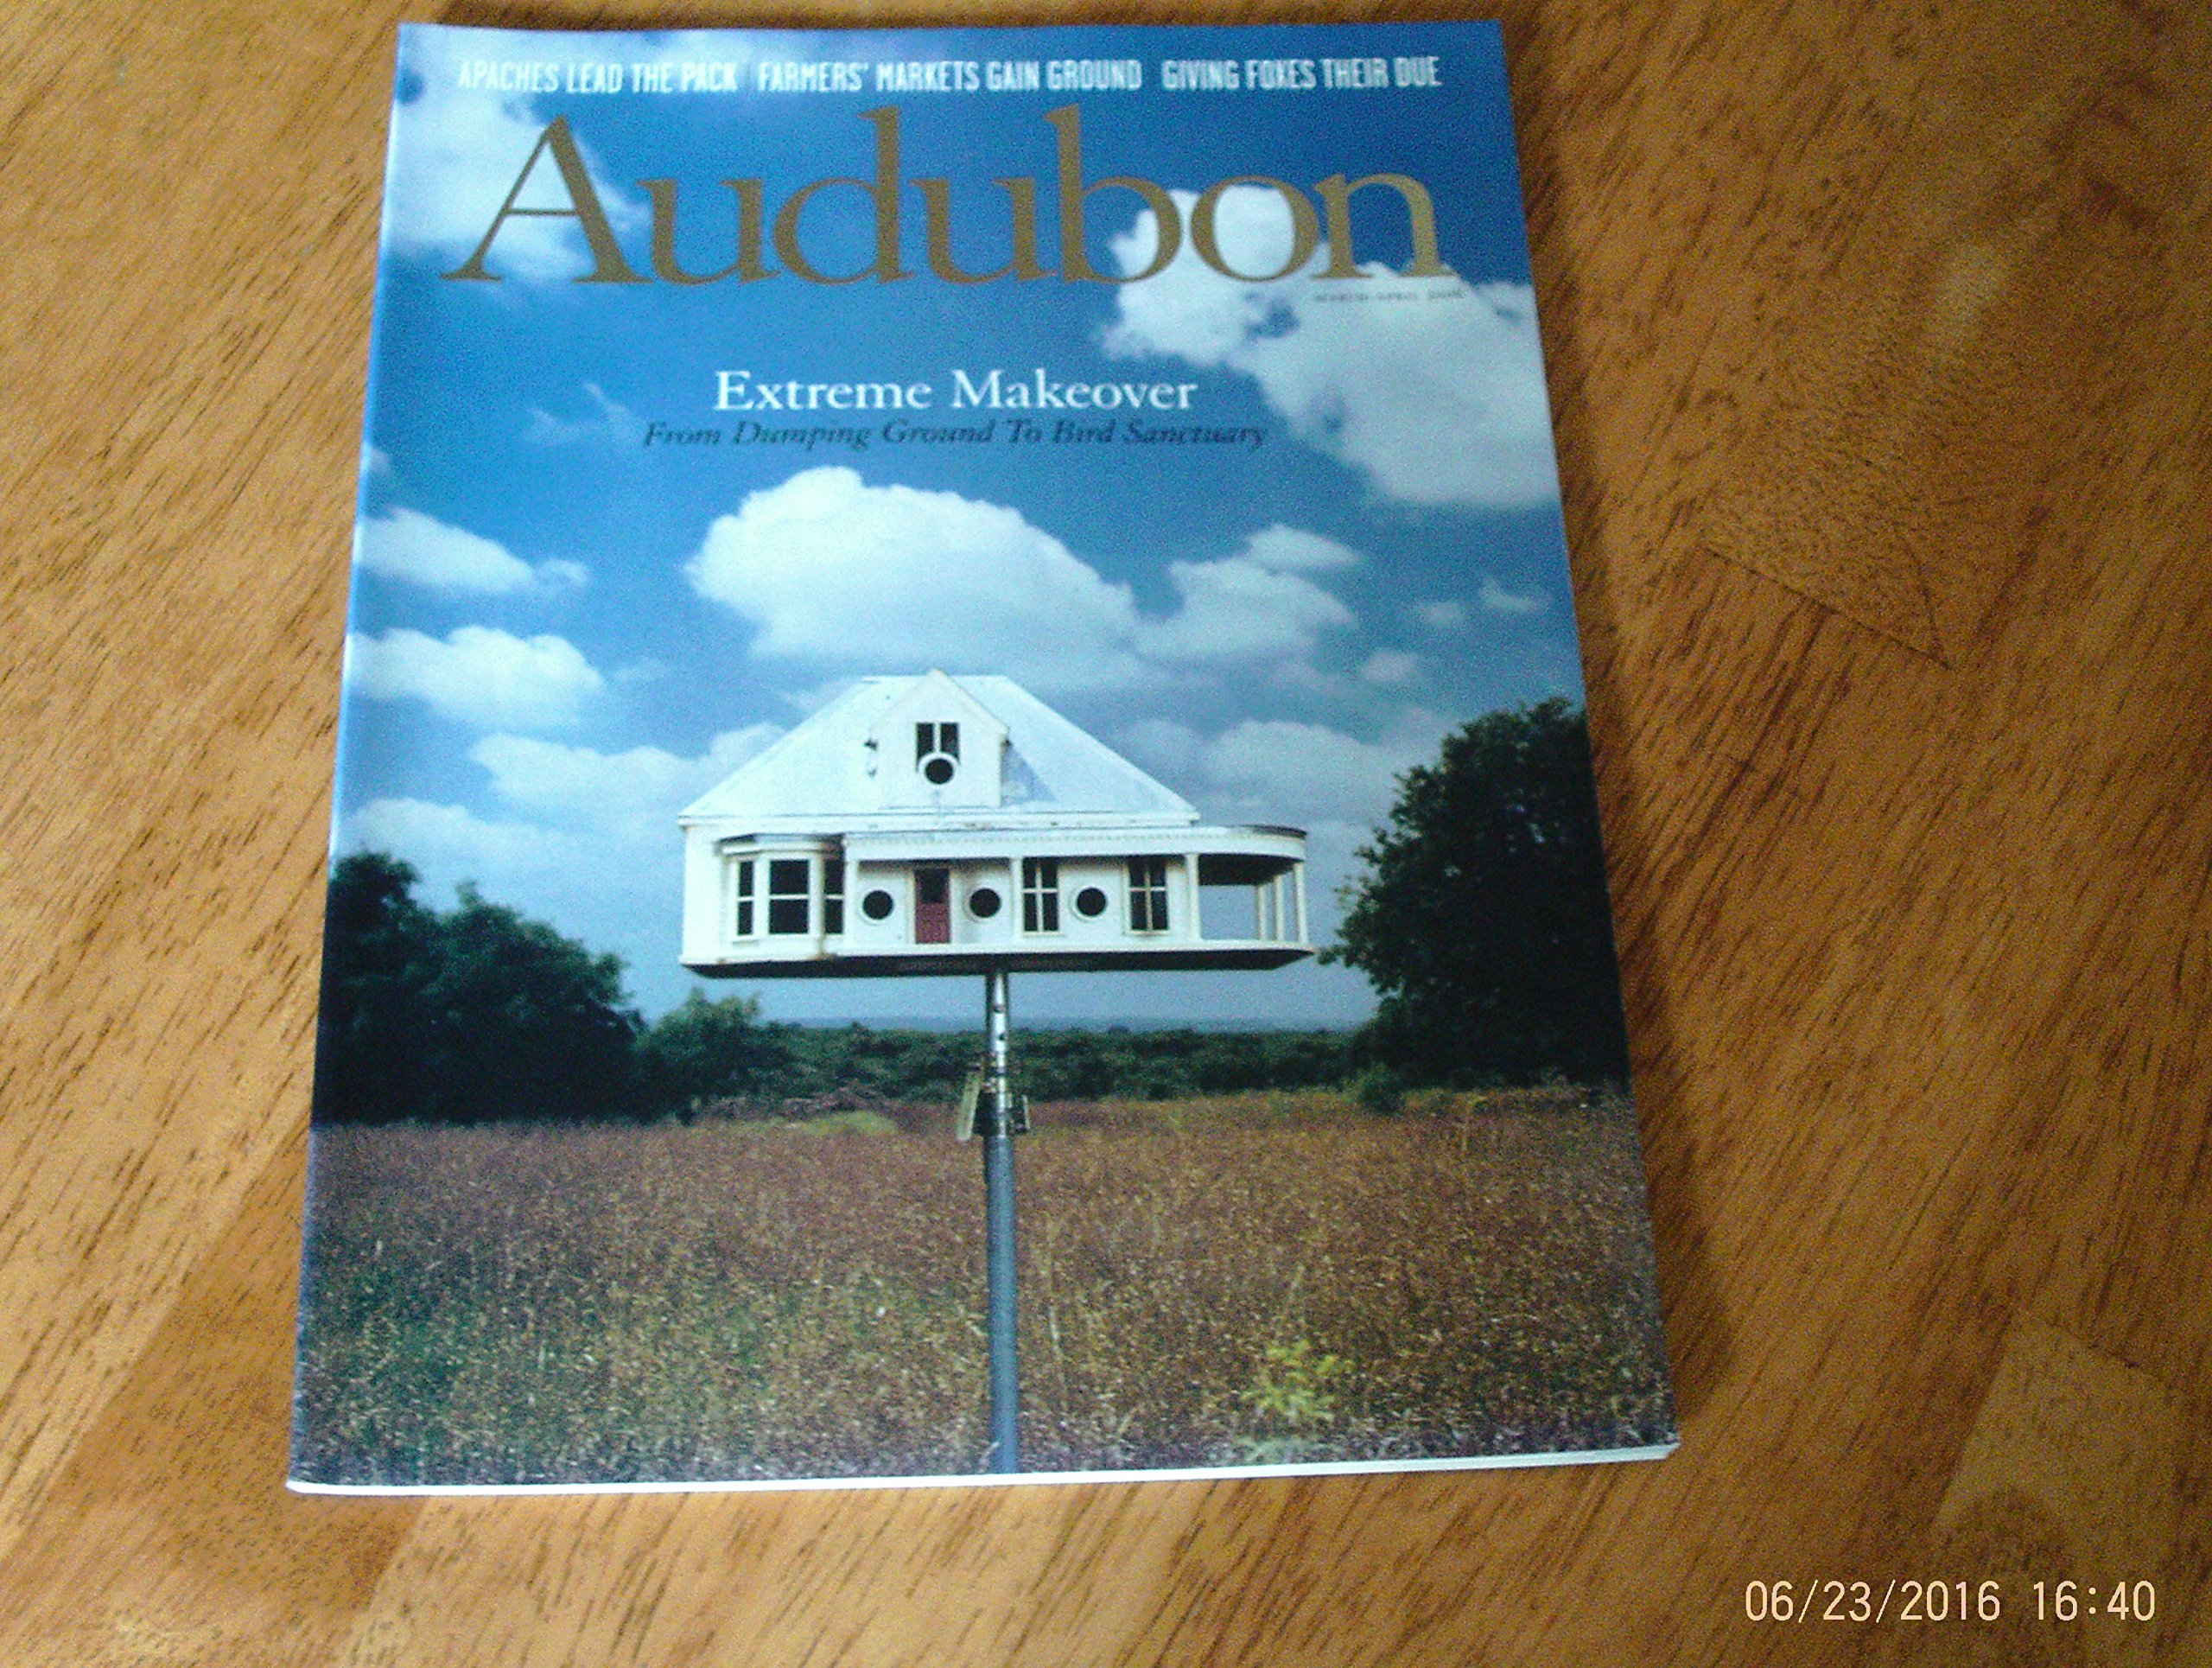 Audubon Magazine, Vol. 108, No. 2 (March April, 2006) pdf epub